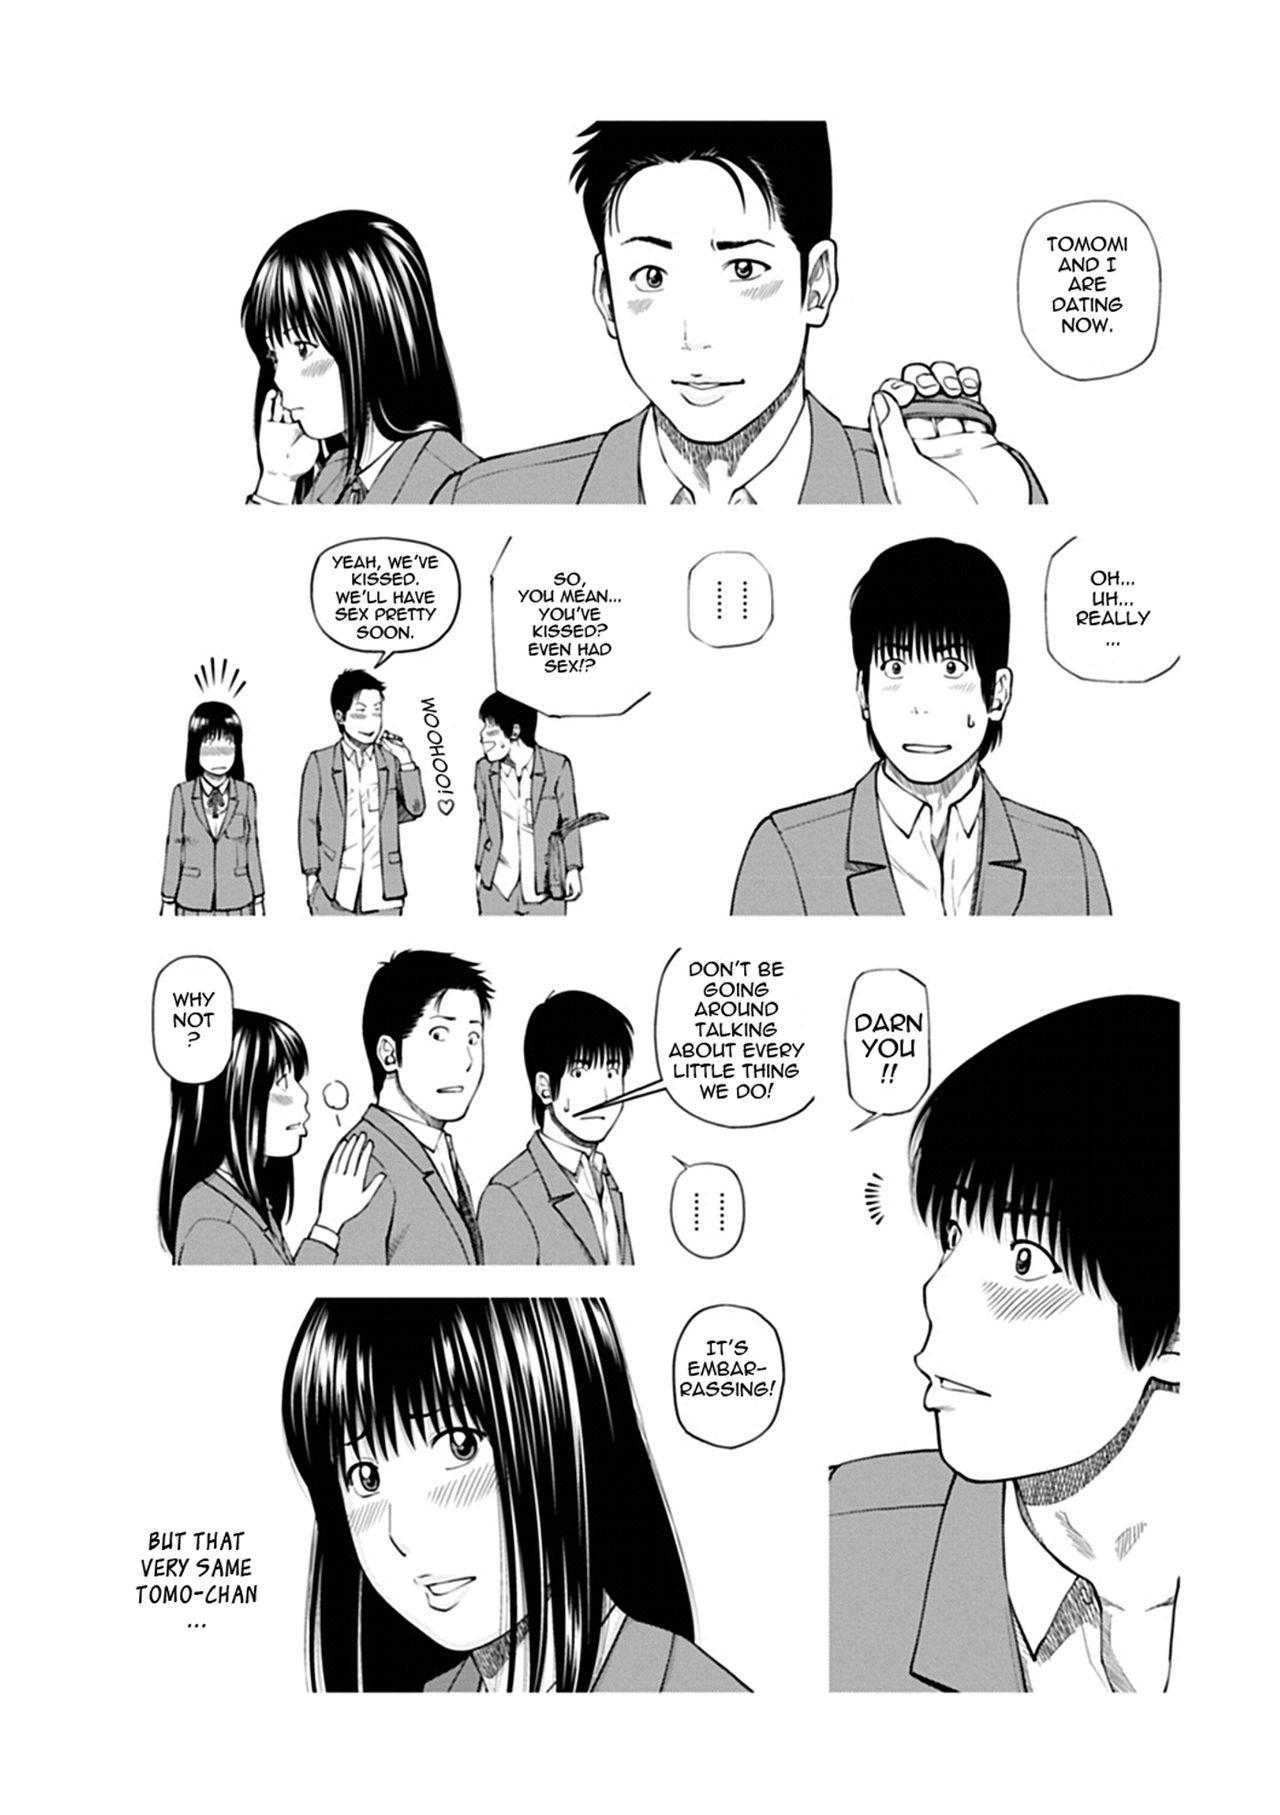 [Kuroki Hidehiko] 36-sai Injuku Sakarizuma | 36-Year-Old Randy Mature Wife [English] {Tadanohito} [Digital] [Uncensored] 116